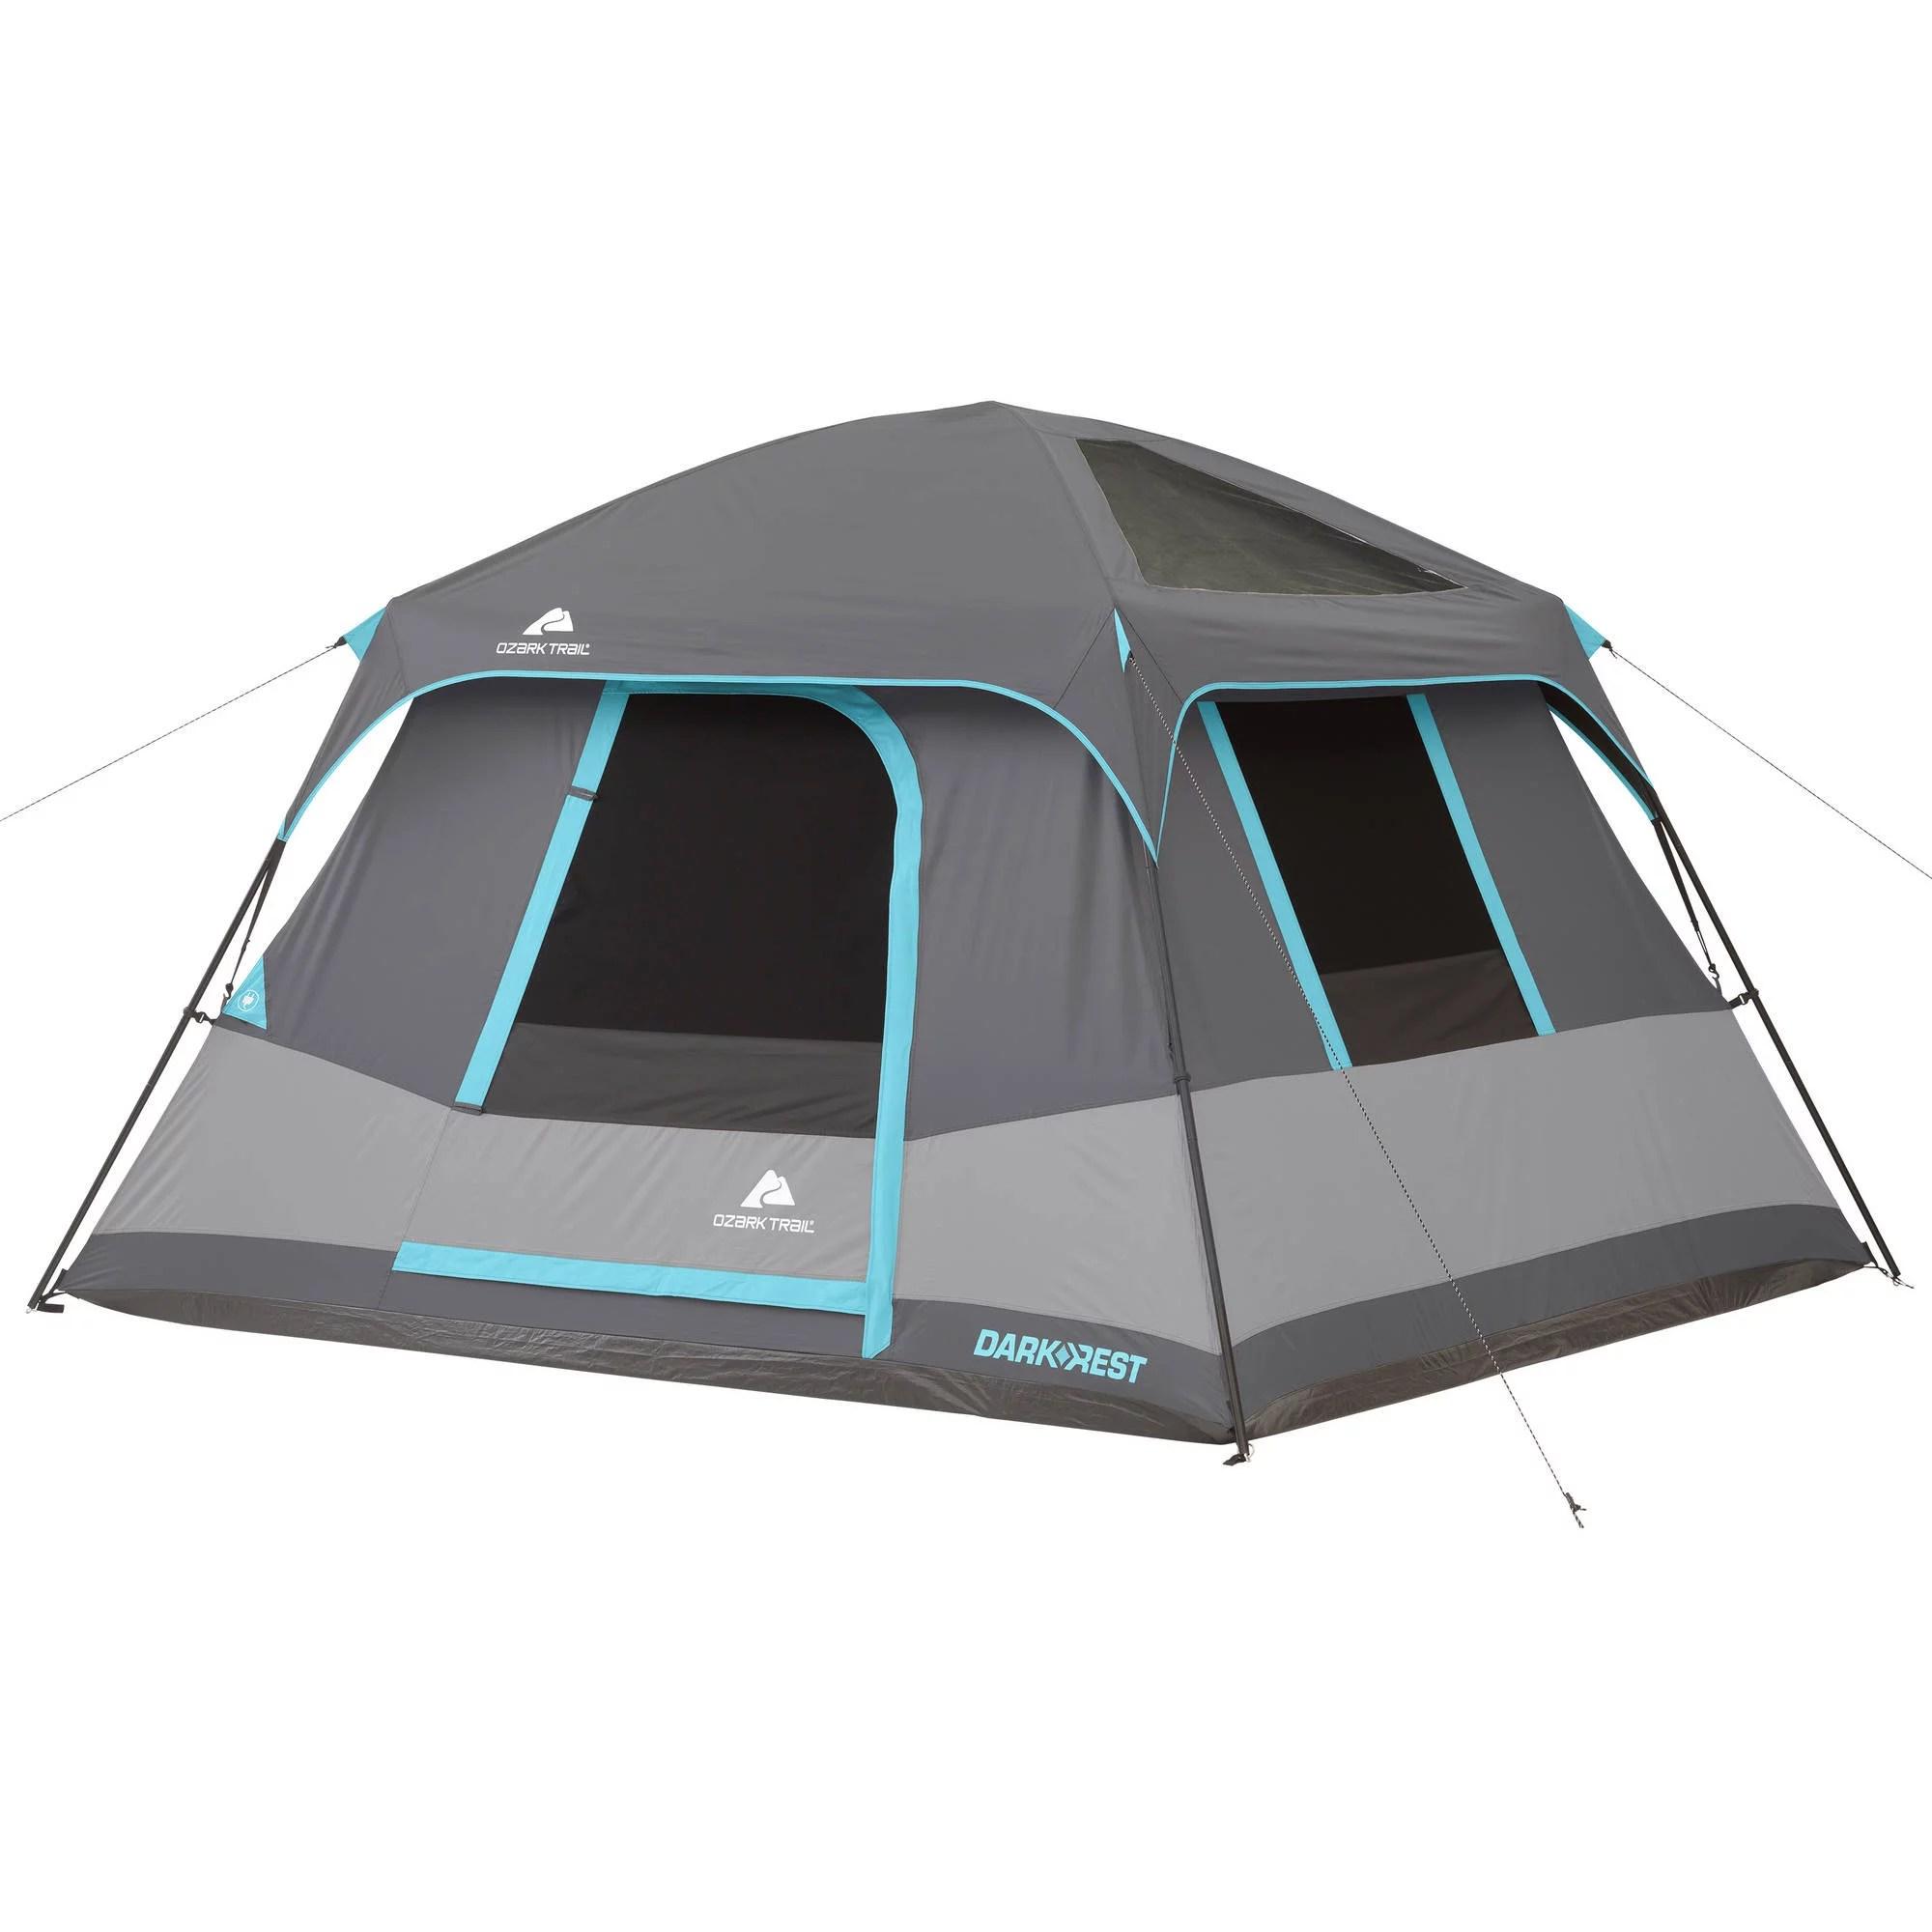 Ozark Trail 10' x 9' Dark Rest Frp Cabin Tent, Sleeps 6